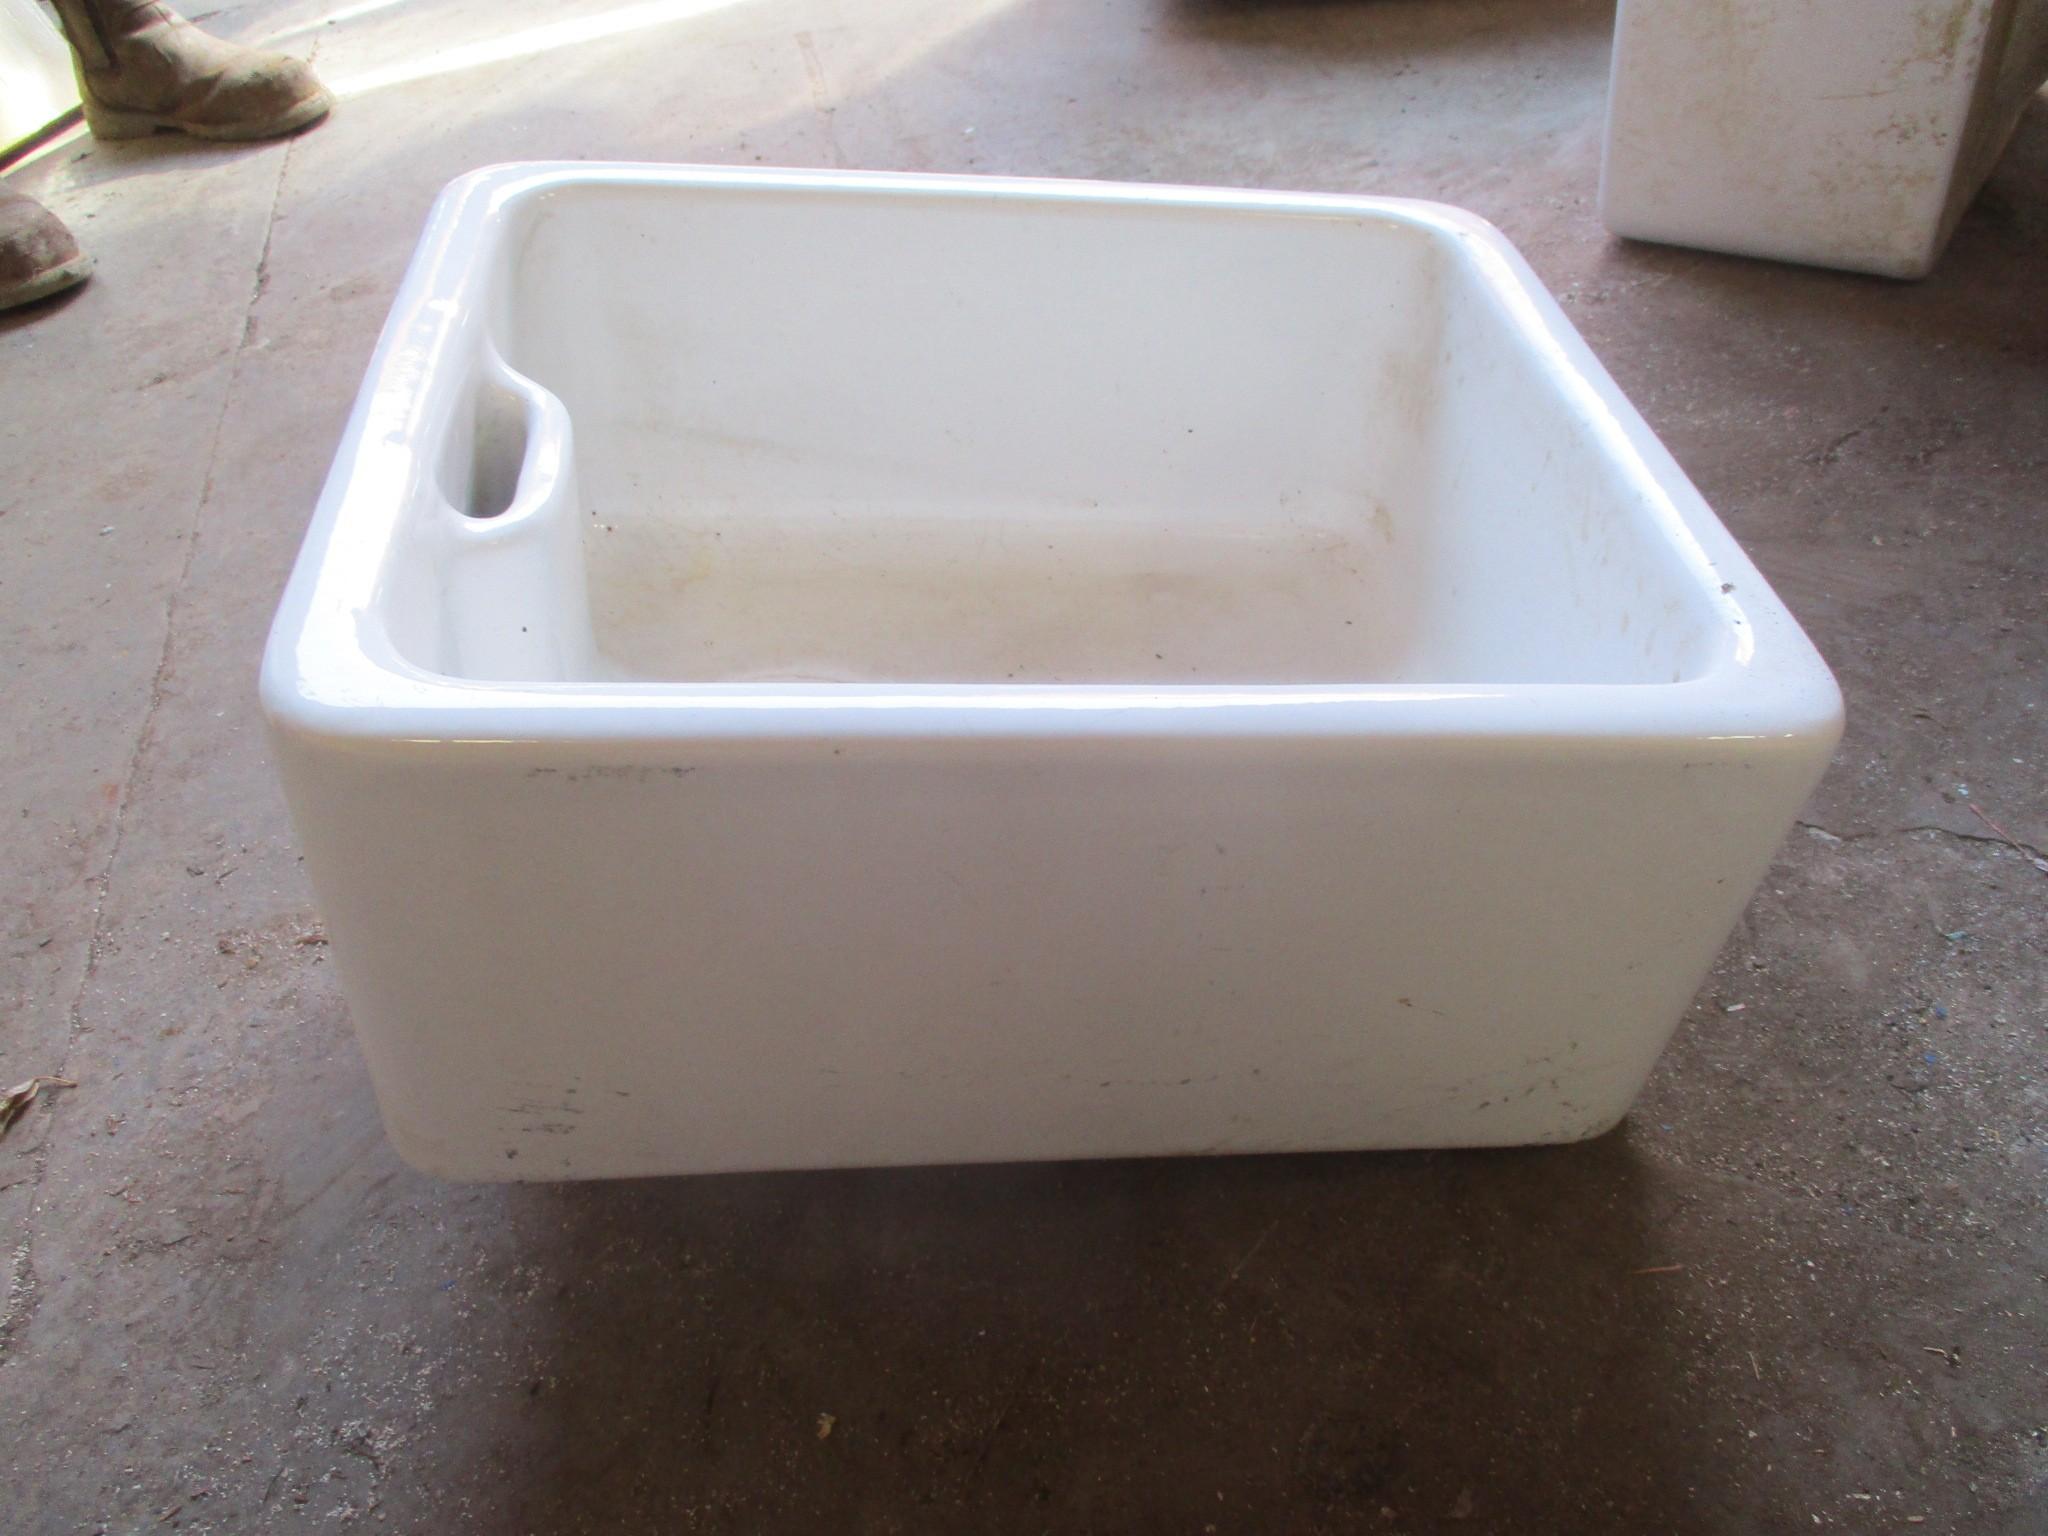 Butler Sinks - Armitage Shanks butler sinks - 18